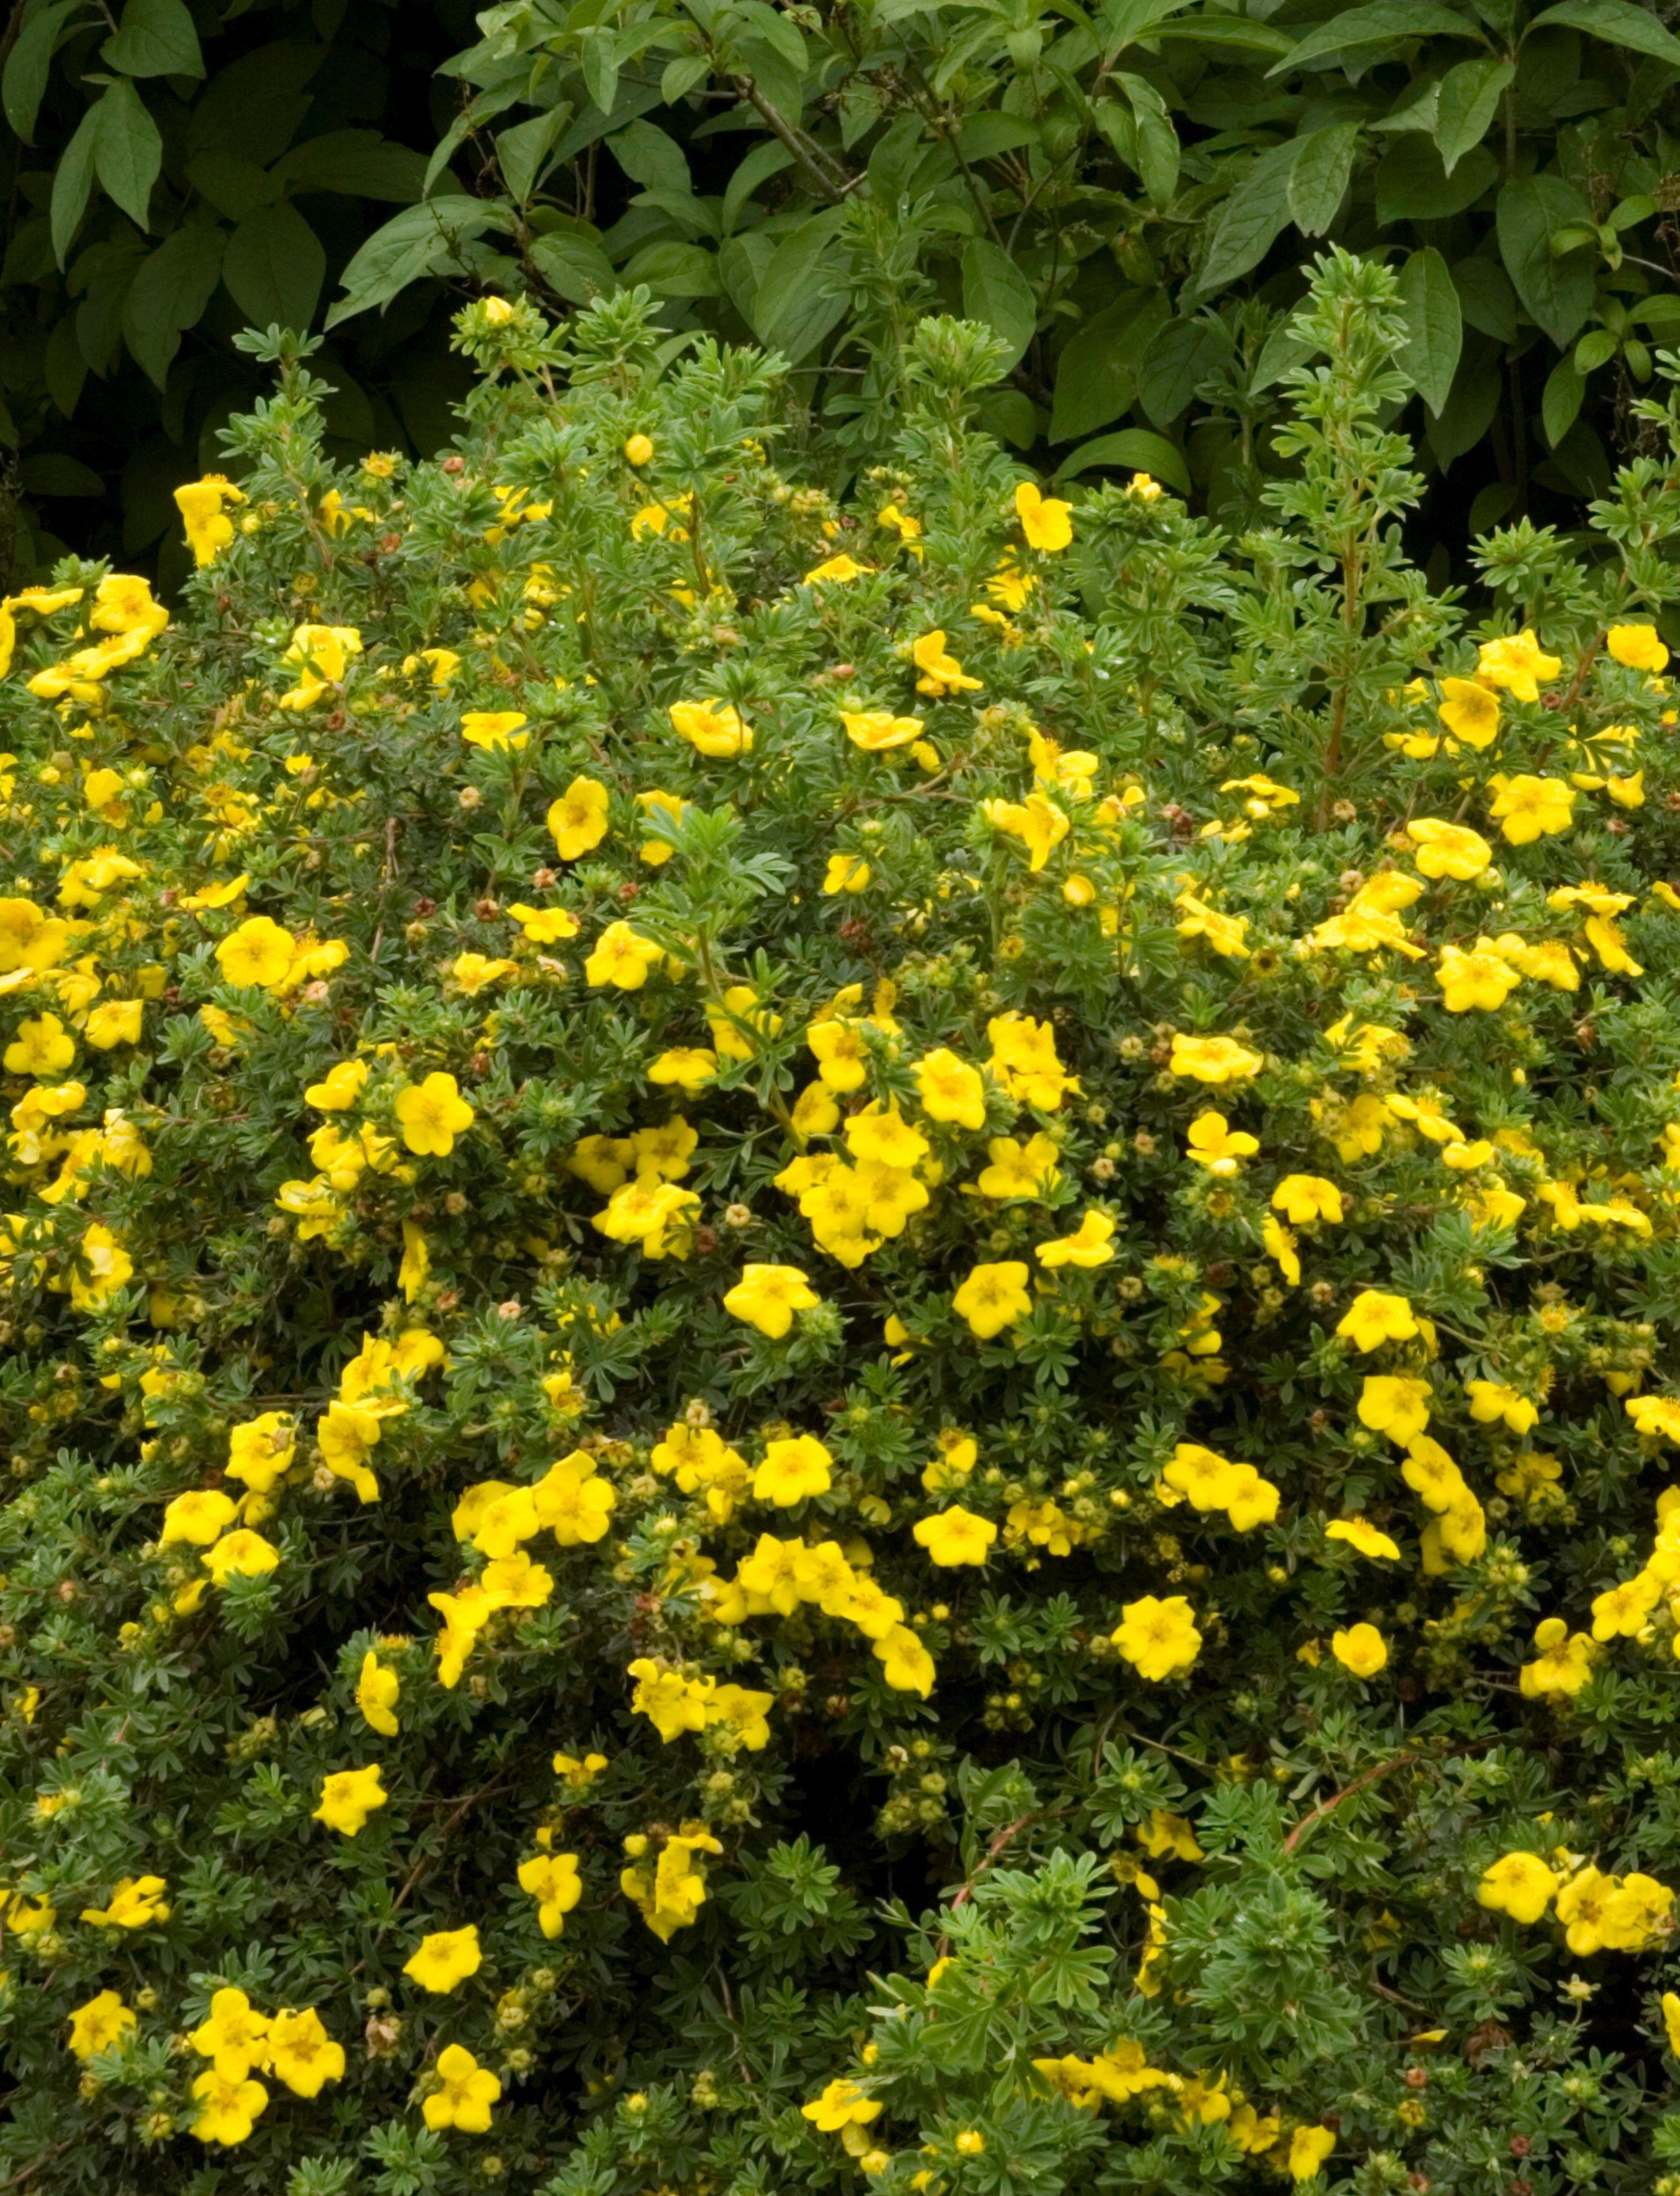 Goldfinger potentilla a versatile small shrub producing large goldfinger potentilla a versatile small shrub producing large rich yellow buttercup like flowers dhlflorist Gallery